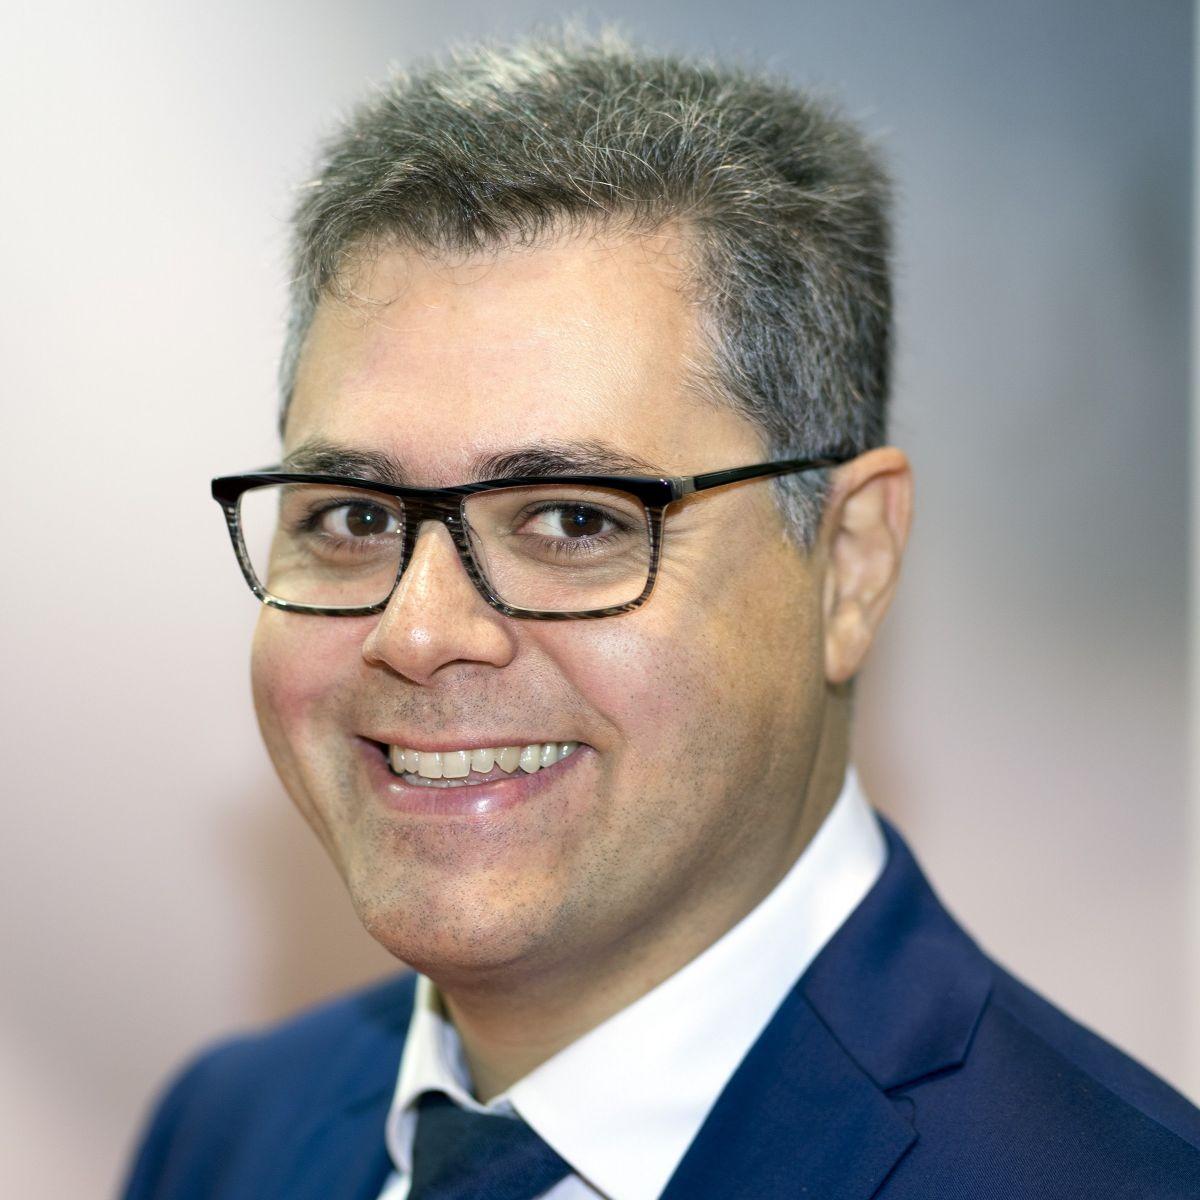 Laurent Kodjikian, MD, PhD